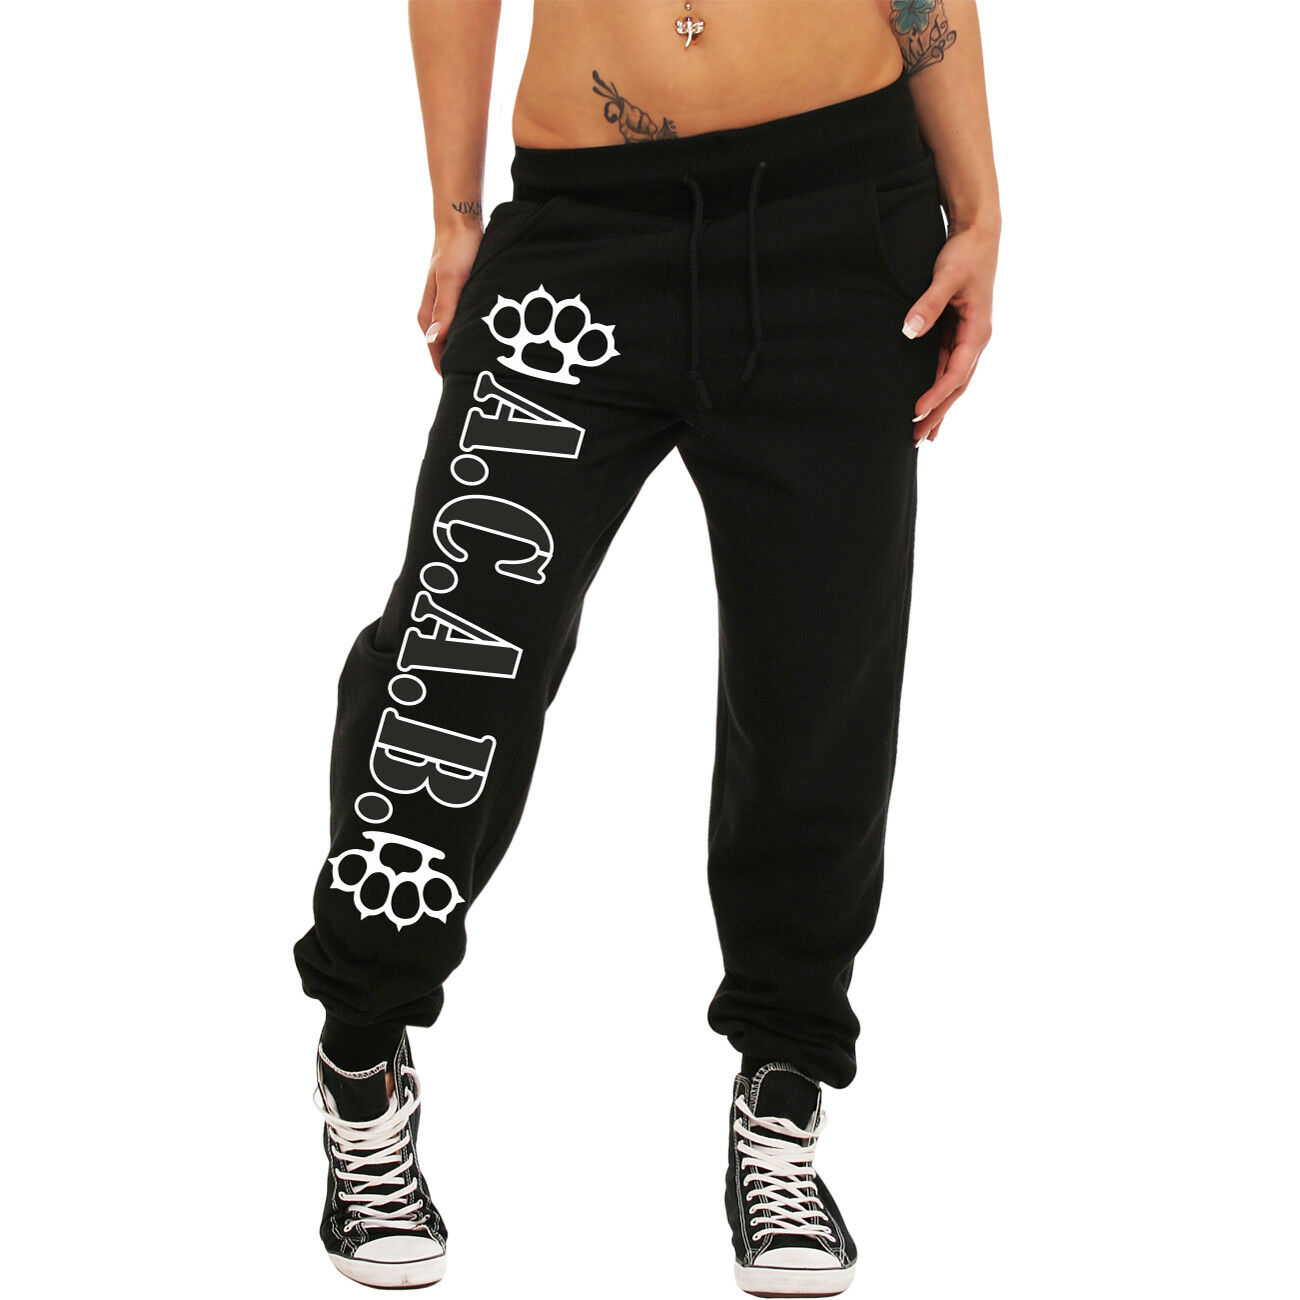 Frauen Mädchen Jogginghose A.C. A.B. schlagring skin punk style ultras Hools